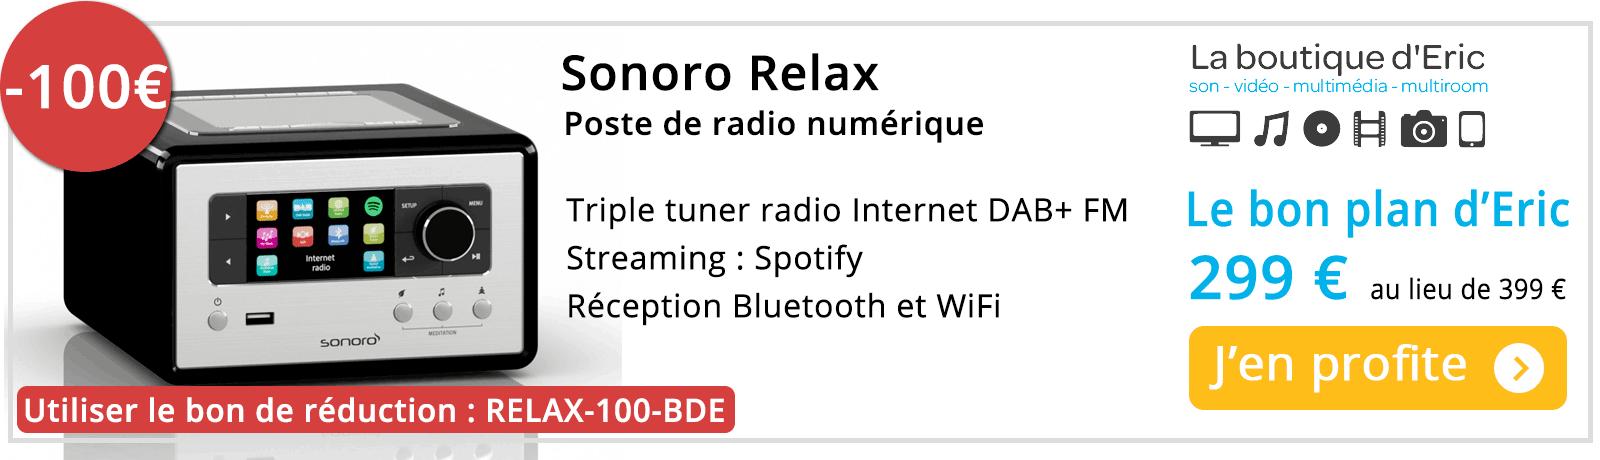 Sonoro Relax : poste de radio connecté Internet et WiFi